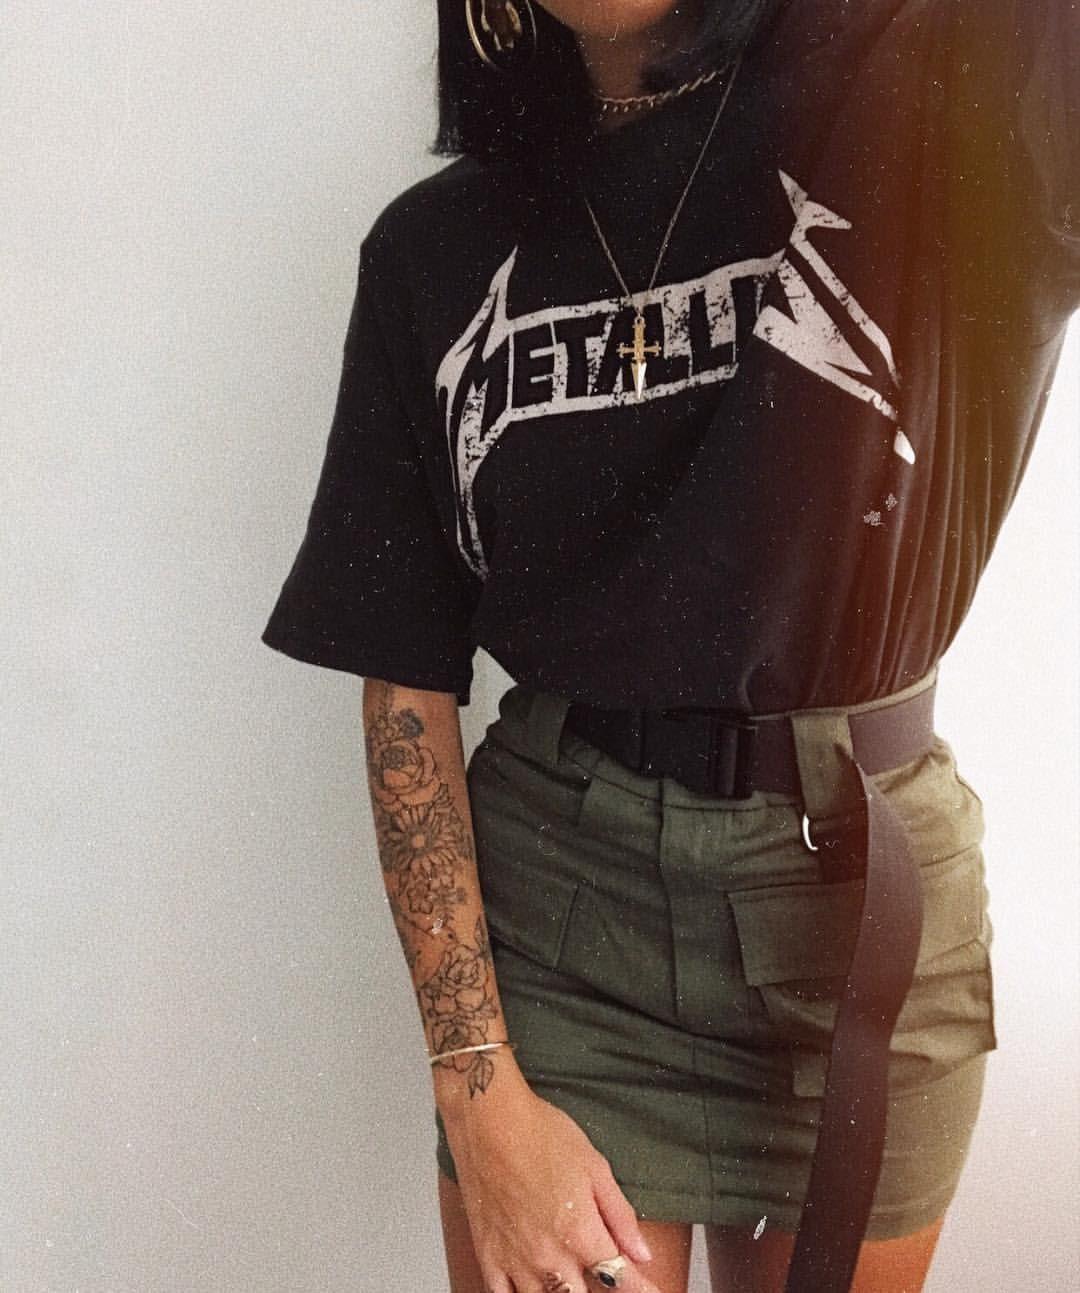 "𝔰𝔬𝔭𝔥𝔦𝔢 𝔯 on Instagram: ""skirt from @fashionnova 🕸 #novababe #ad"" -  Pɪɴᴛᴇʀᴇsᴛ ~ ᴇᴍᴍᴀ_ᴡᴇᴇᴋʟʏ ☆ Instagram baddie outfit inspiration / idea - #fashionnova #fasionnova #fasionportfolio #fasionwork #Instagram #novababe #punkfasion #Skirt #𝔯 #𝕱𝖔𝖑𝖑𝖔𝖜"